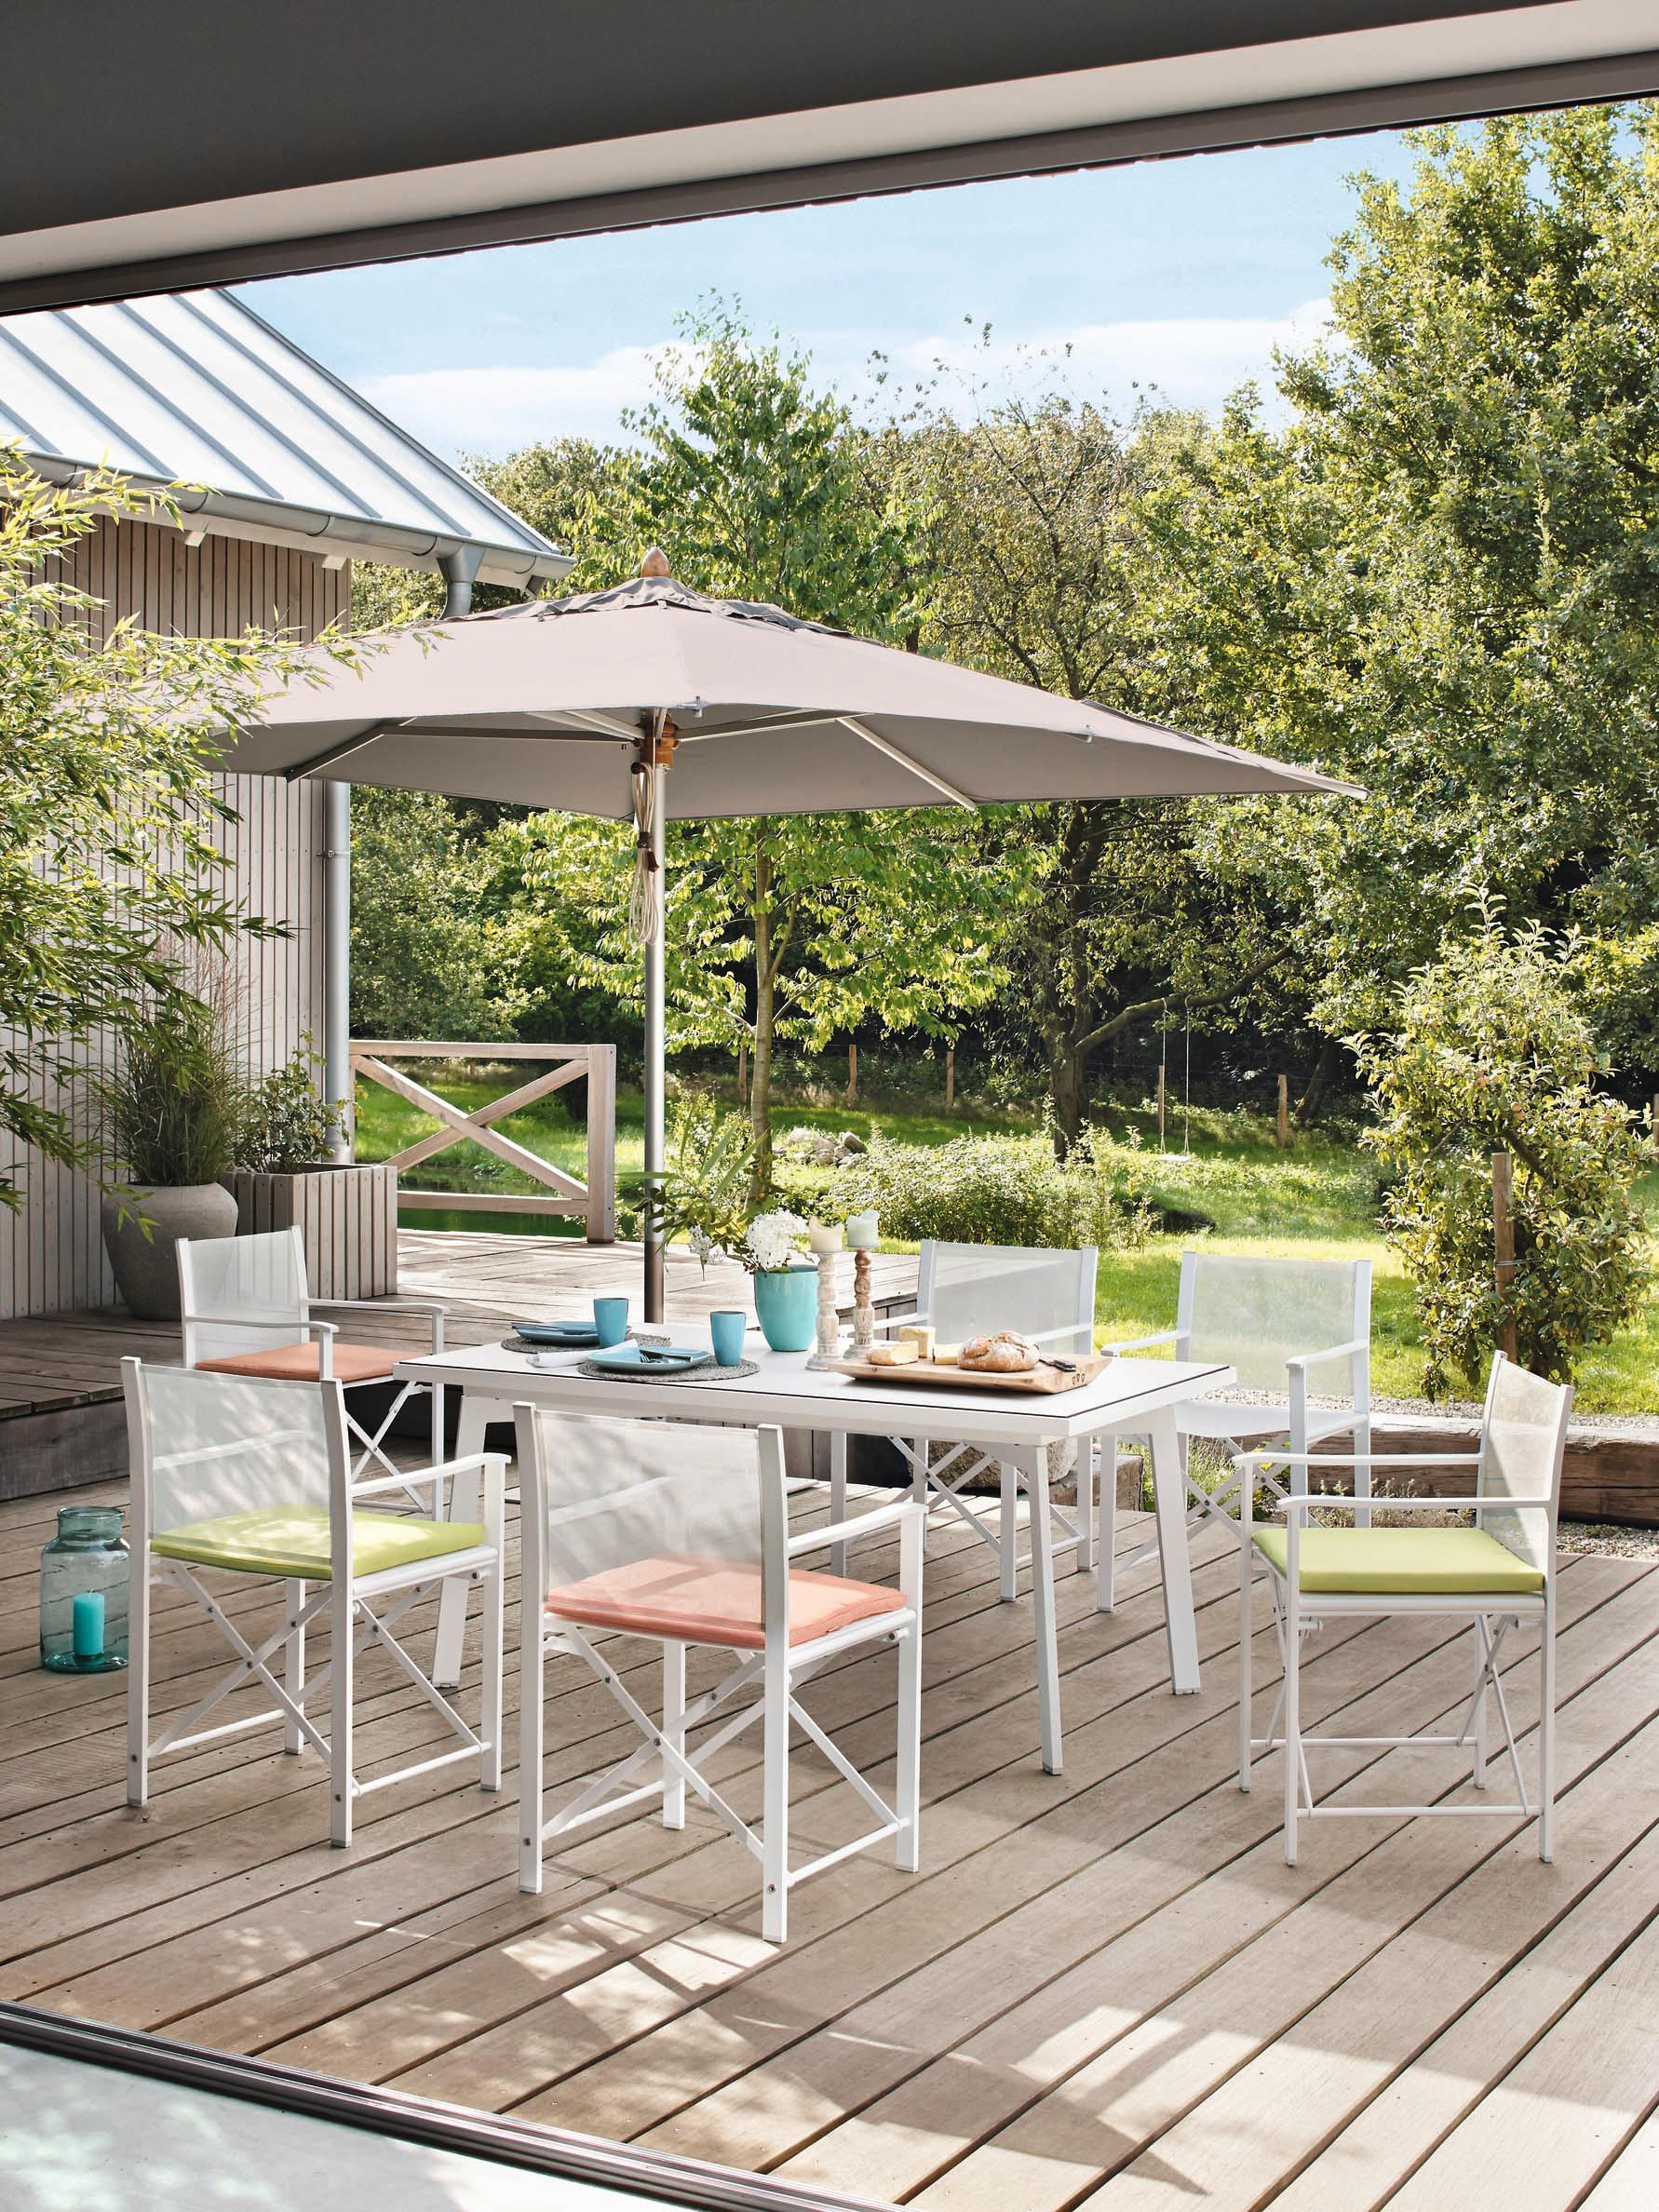 Bunte Sitzkissen Als Blickfang Stuhl Gartenmöbel